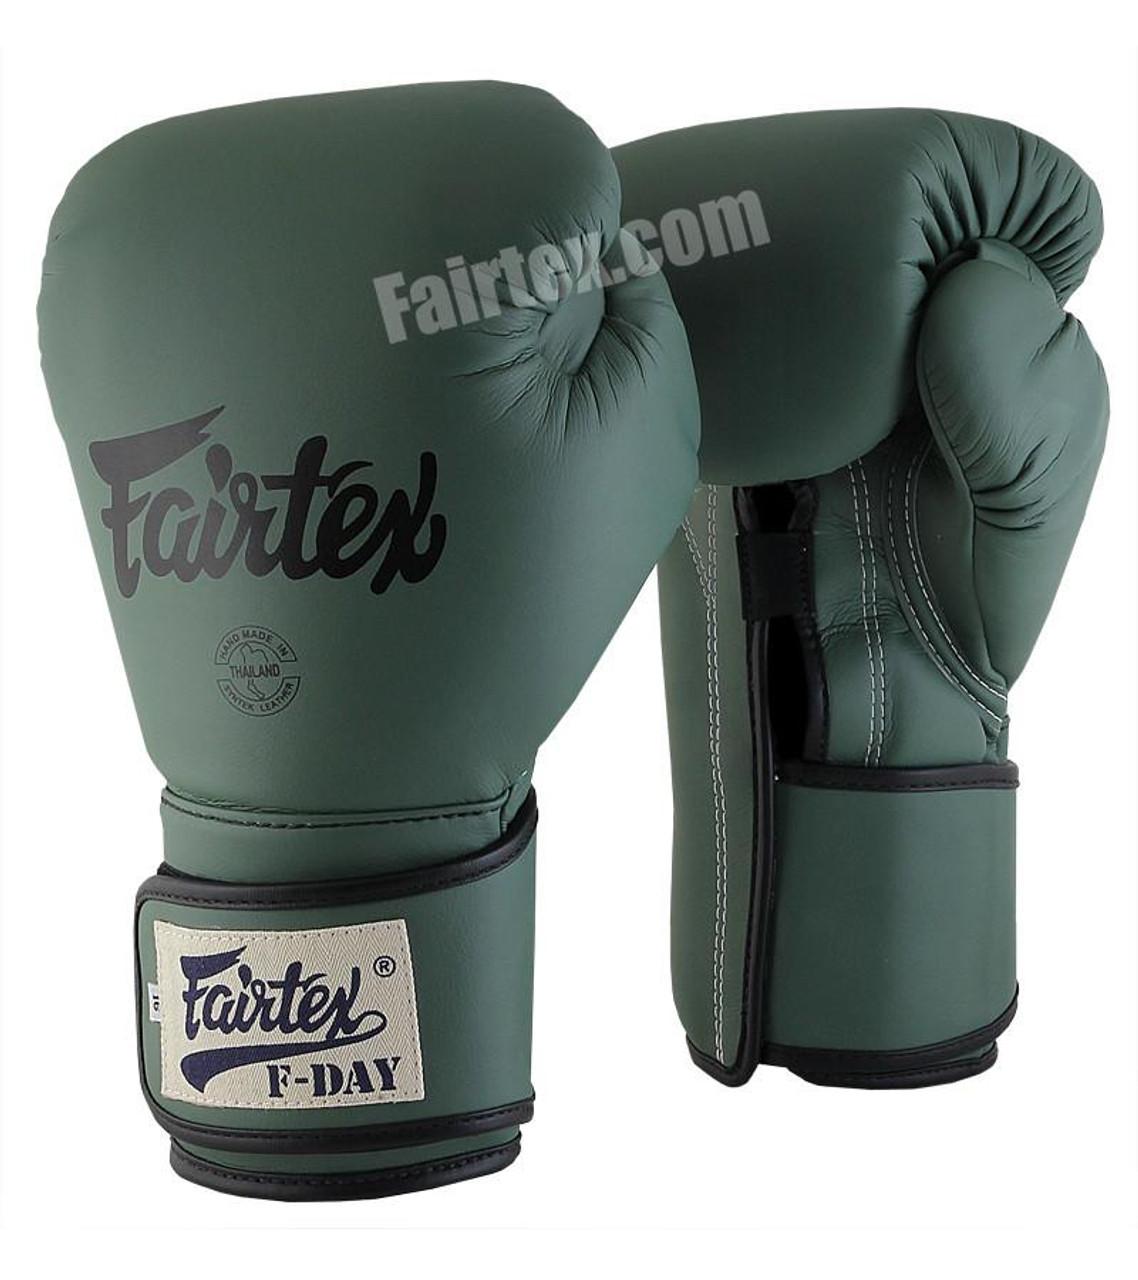 Fairtex Muay Thai Boxing Gloves F-Day